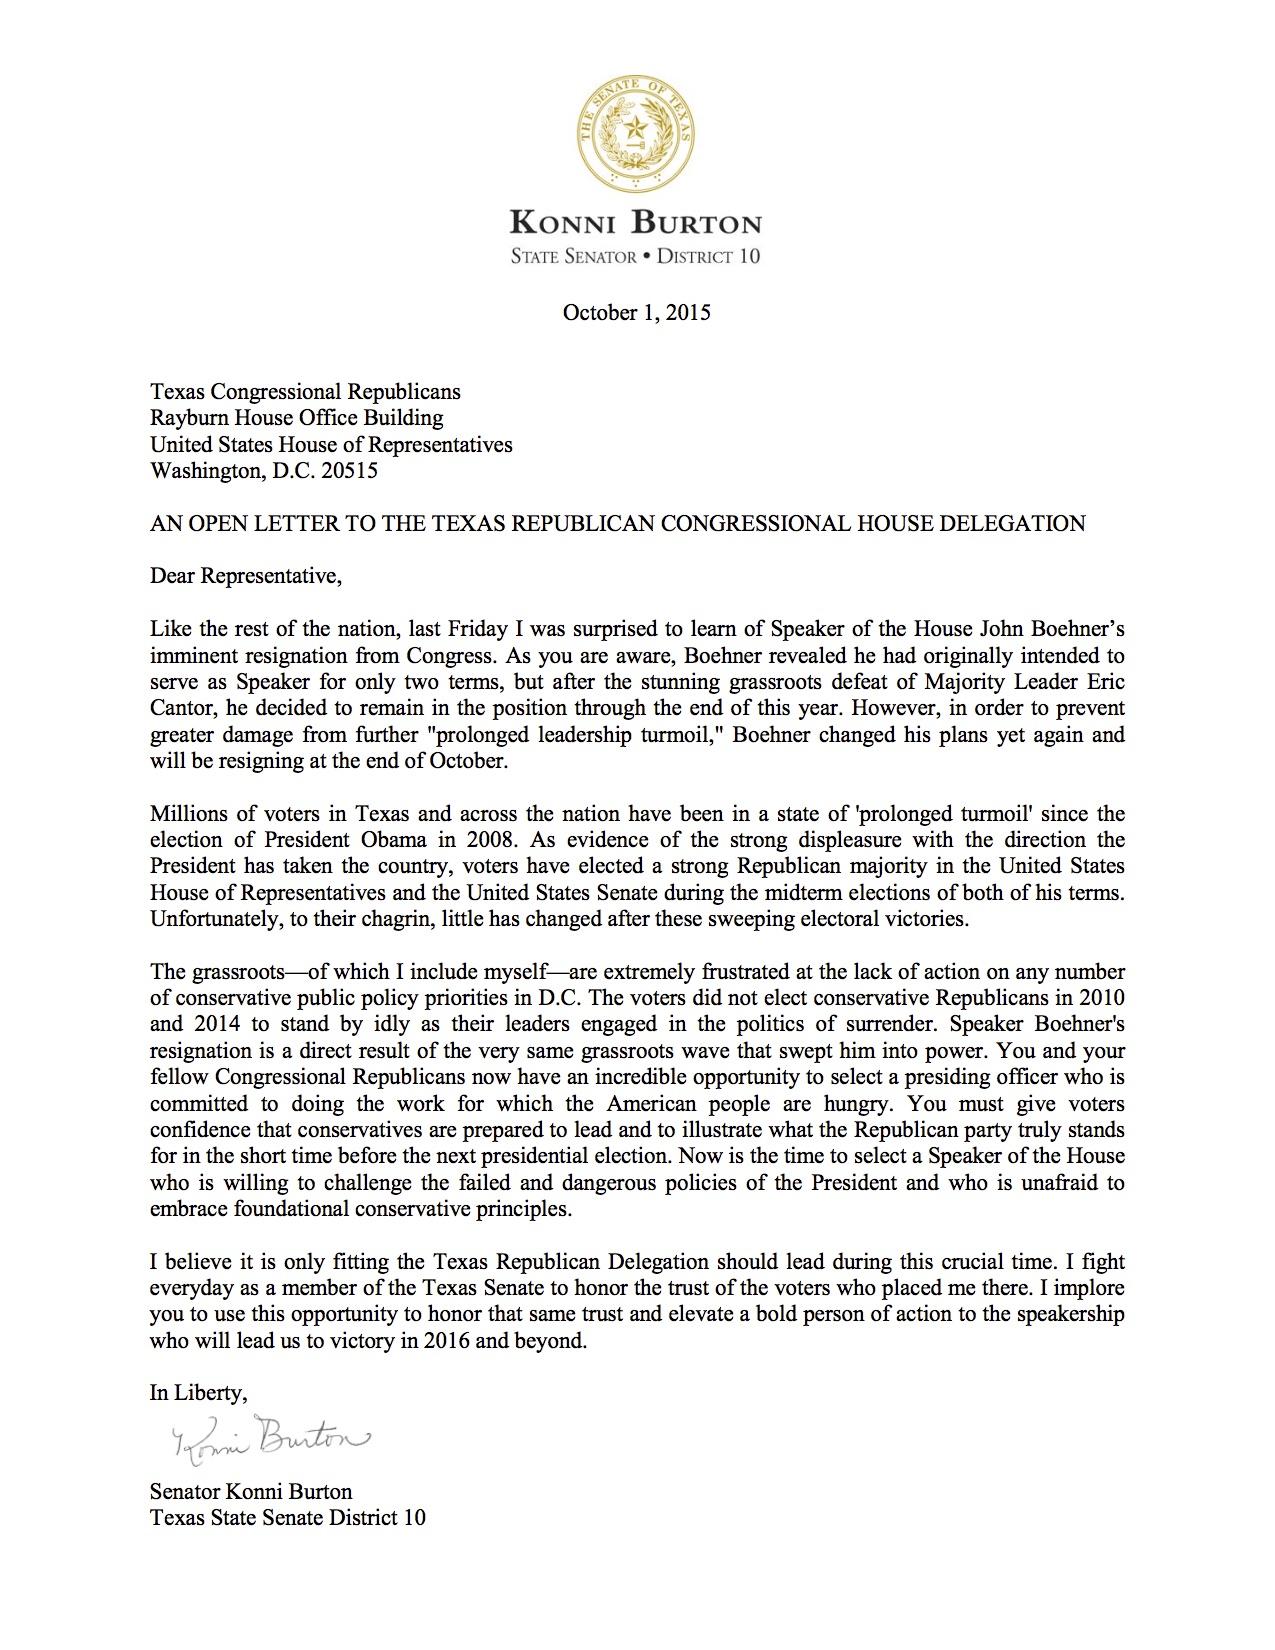 LTR_GENERAL_Open Letter from TX State Senator Konni Burton